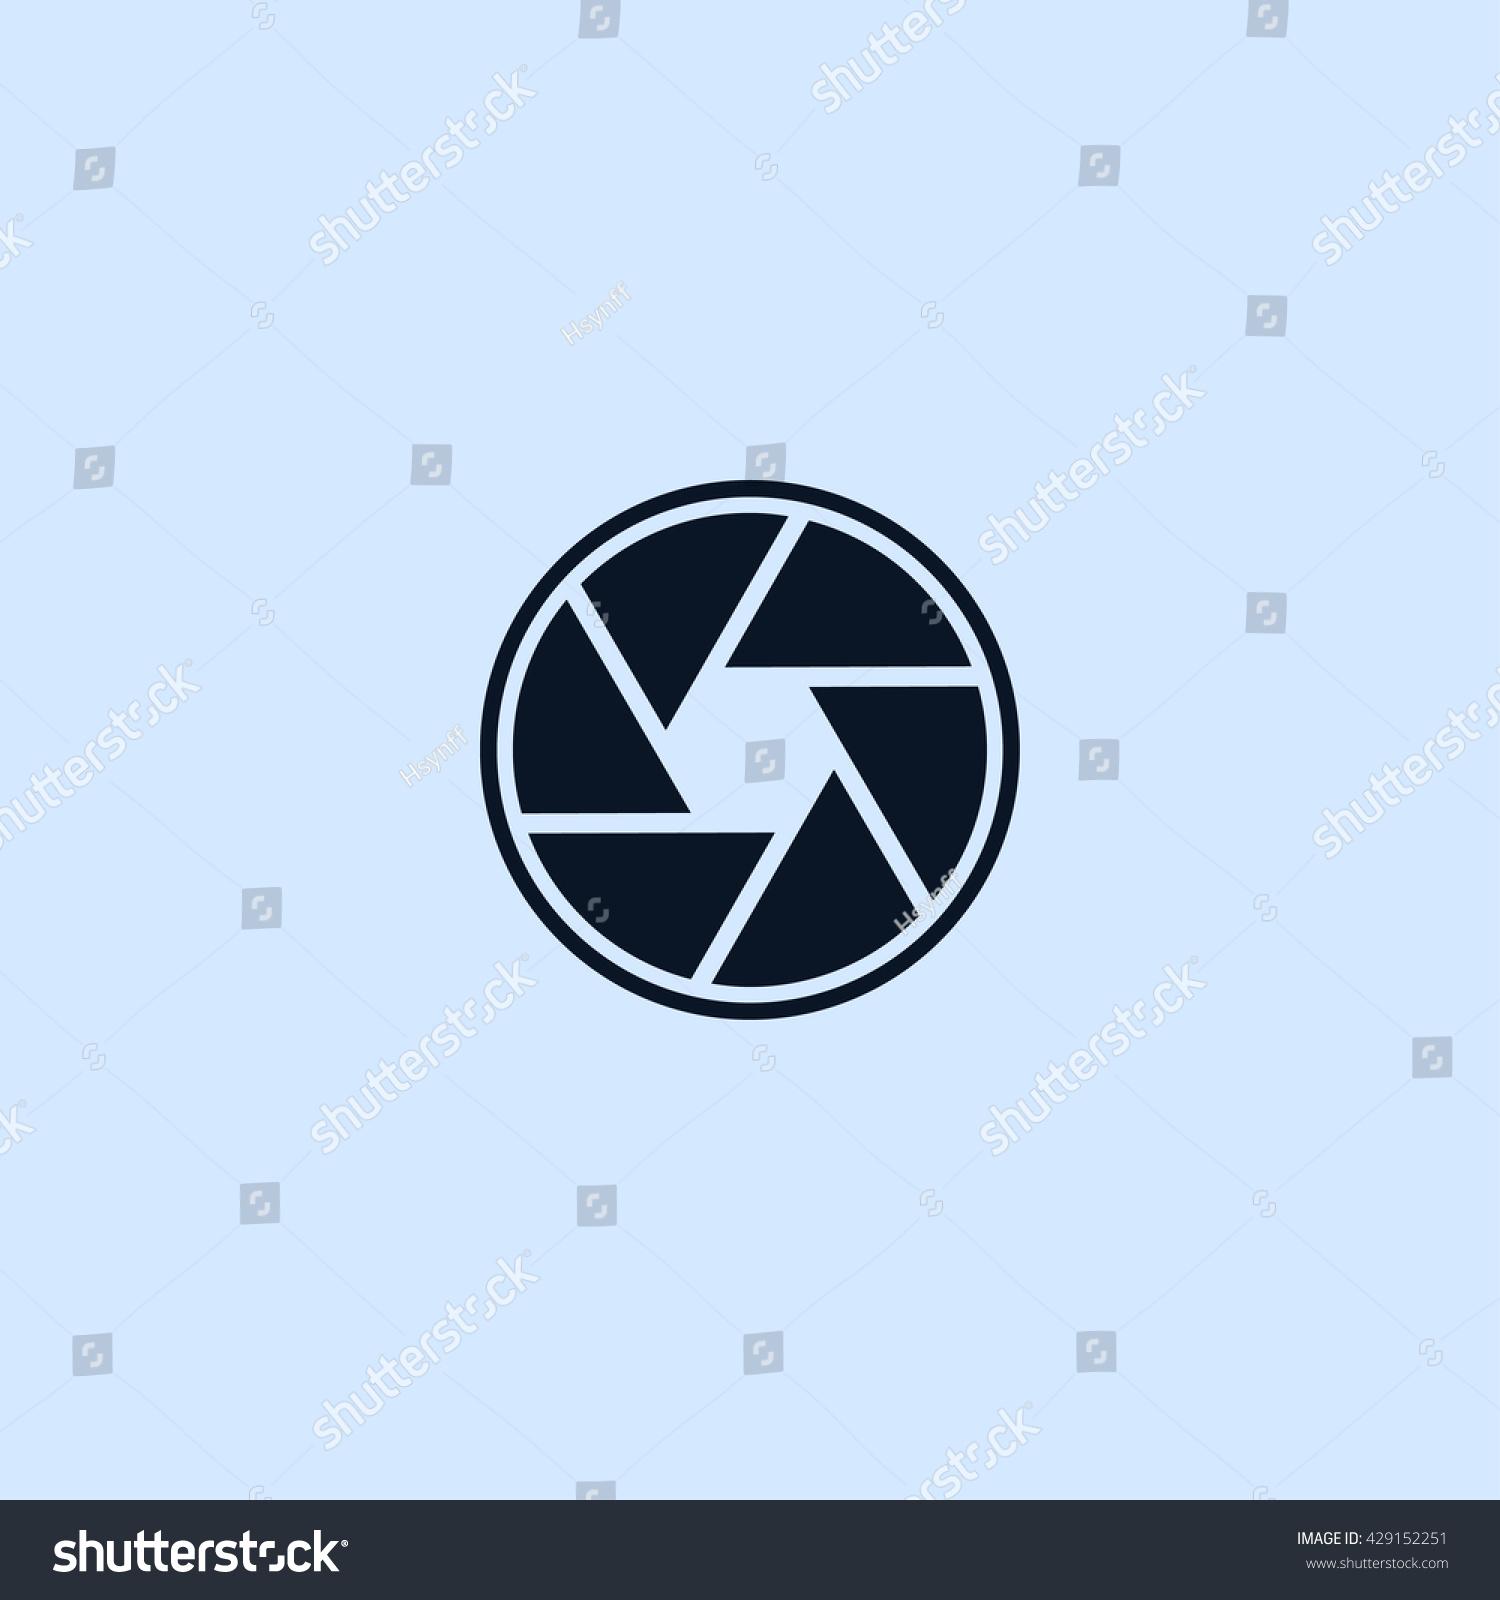 aperture icon. aperture sign